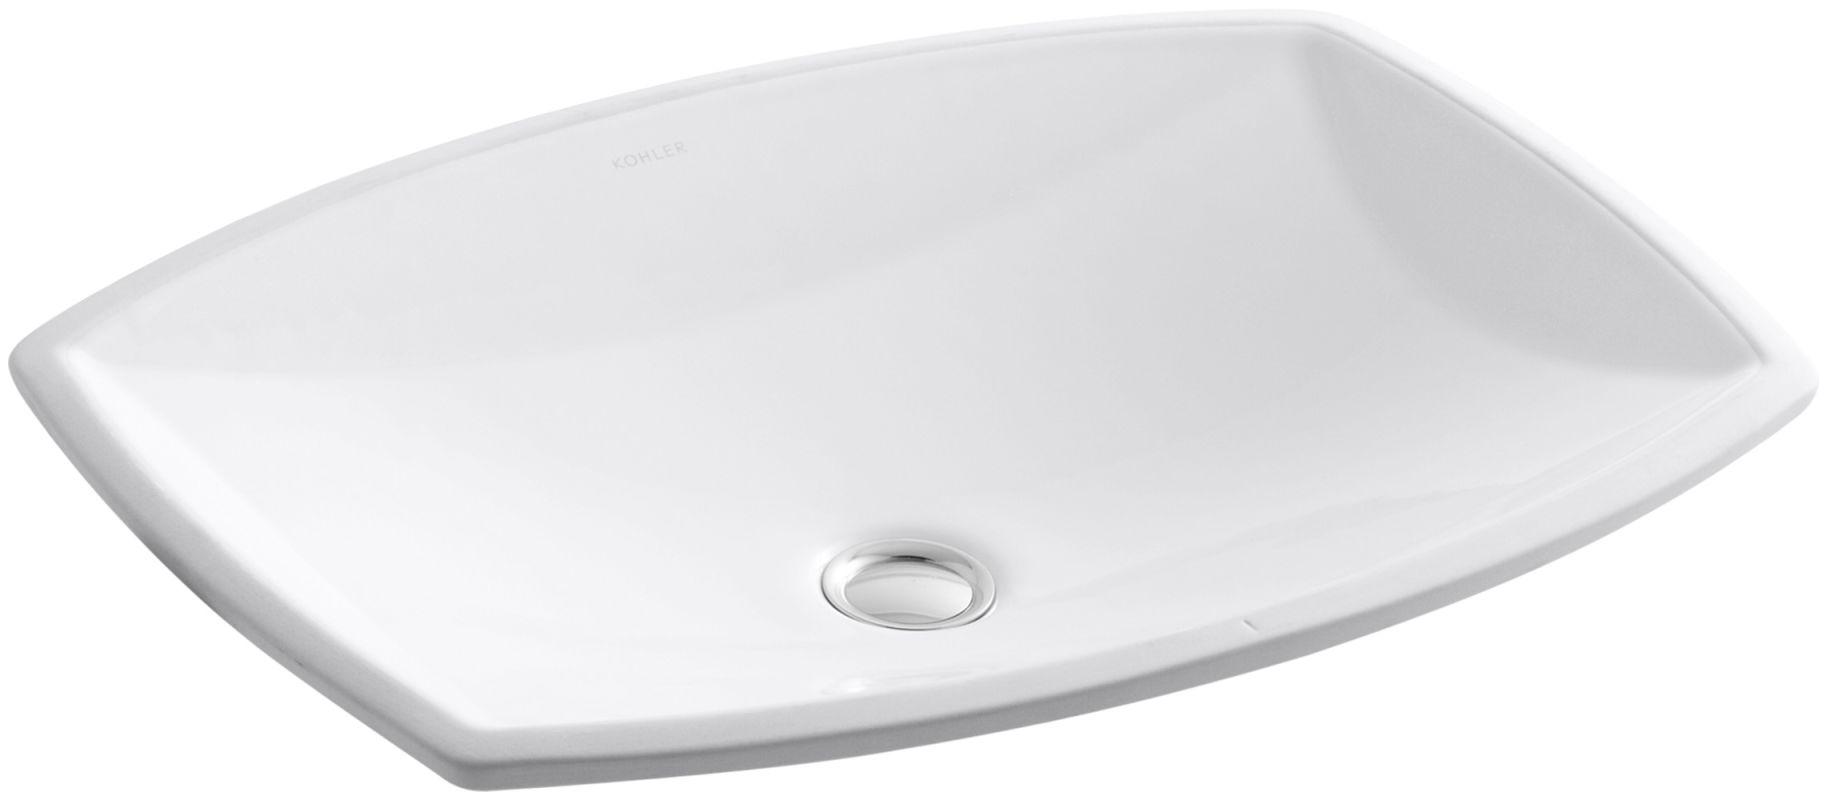 Kohler K 2382 0 White Kelston 19 Quot Undermount Bathroom Sink